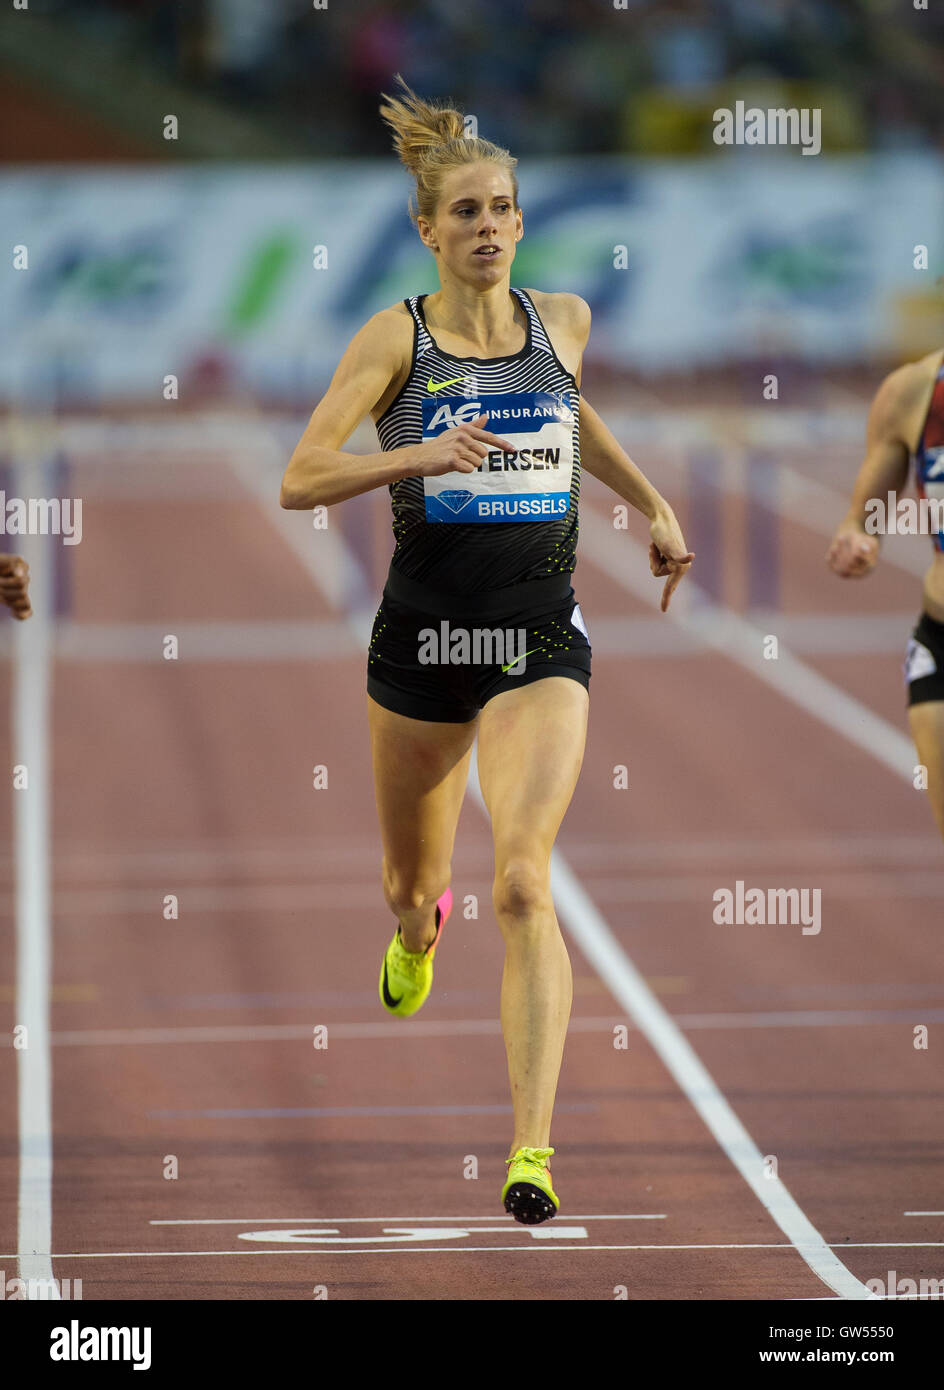 BRUSSELS, BELGIUM - SEPTEMBER 9:  Sara Petersen competing in the Women's 400m Hurdles at the AG Insurance Memorial - Stock Image